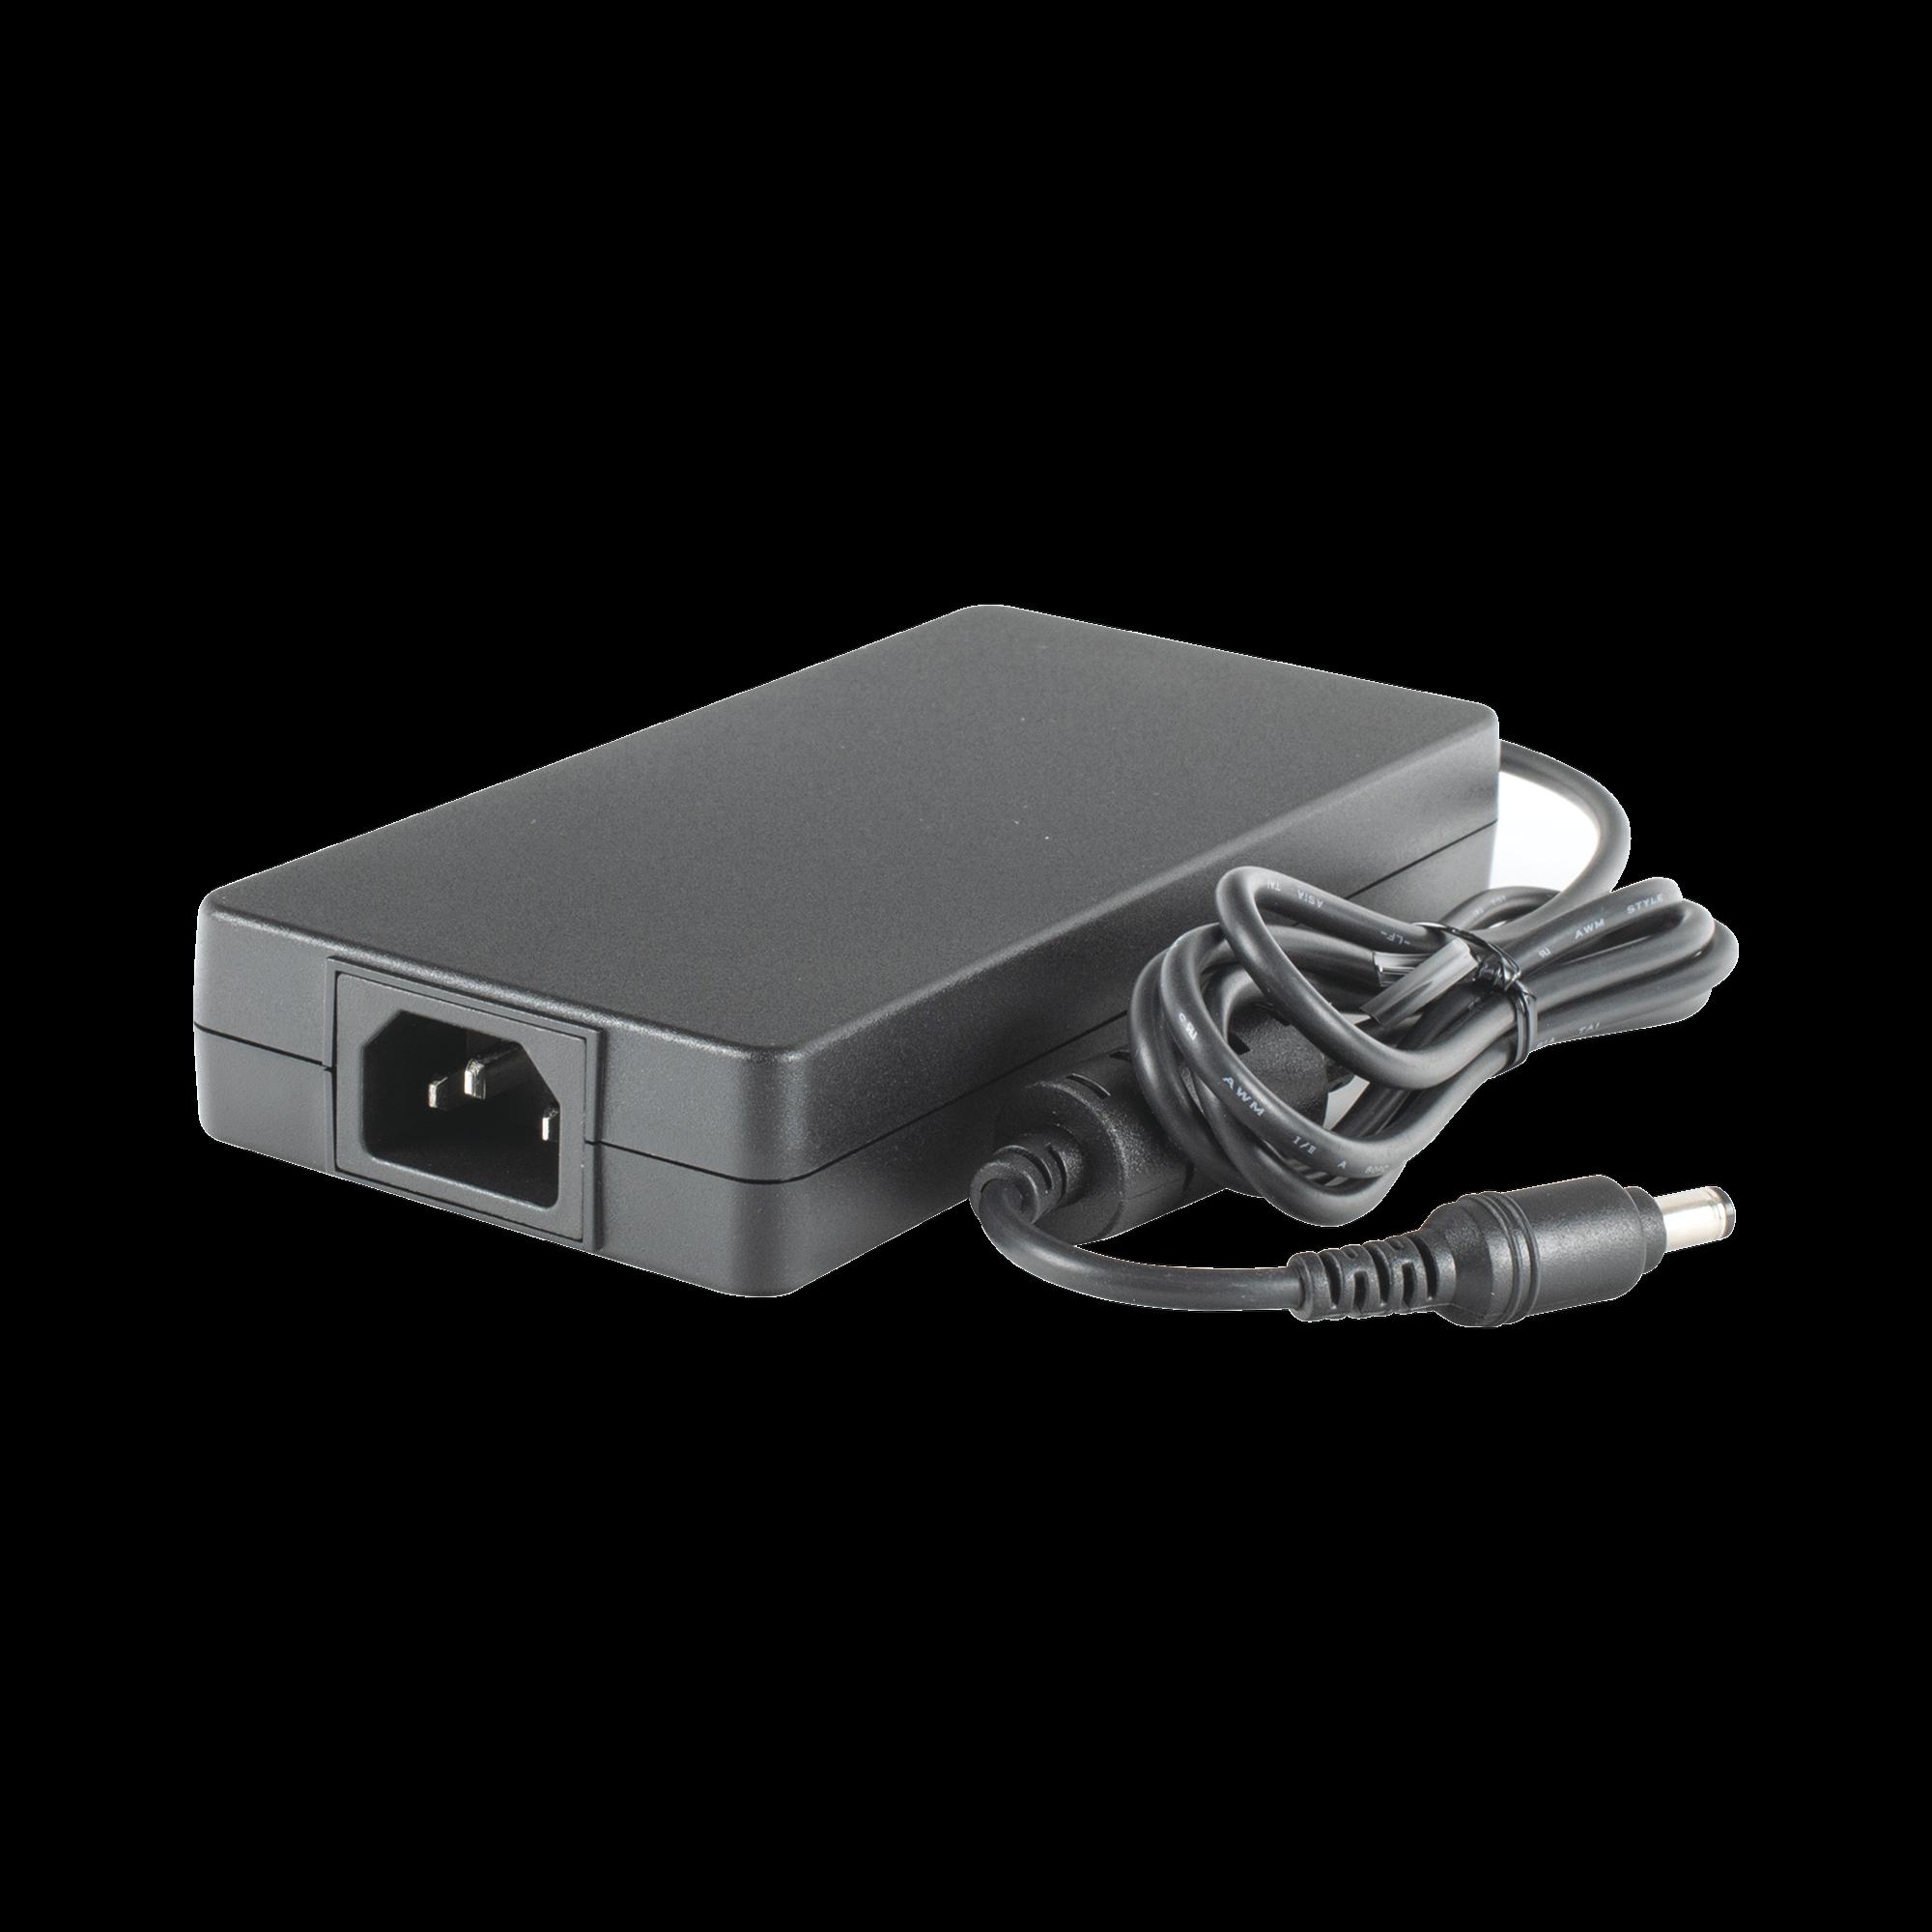 Fuente de Poder Regulada 51 VCD / 2 A / Conector Tipo Plug